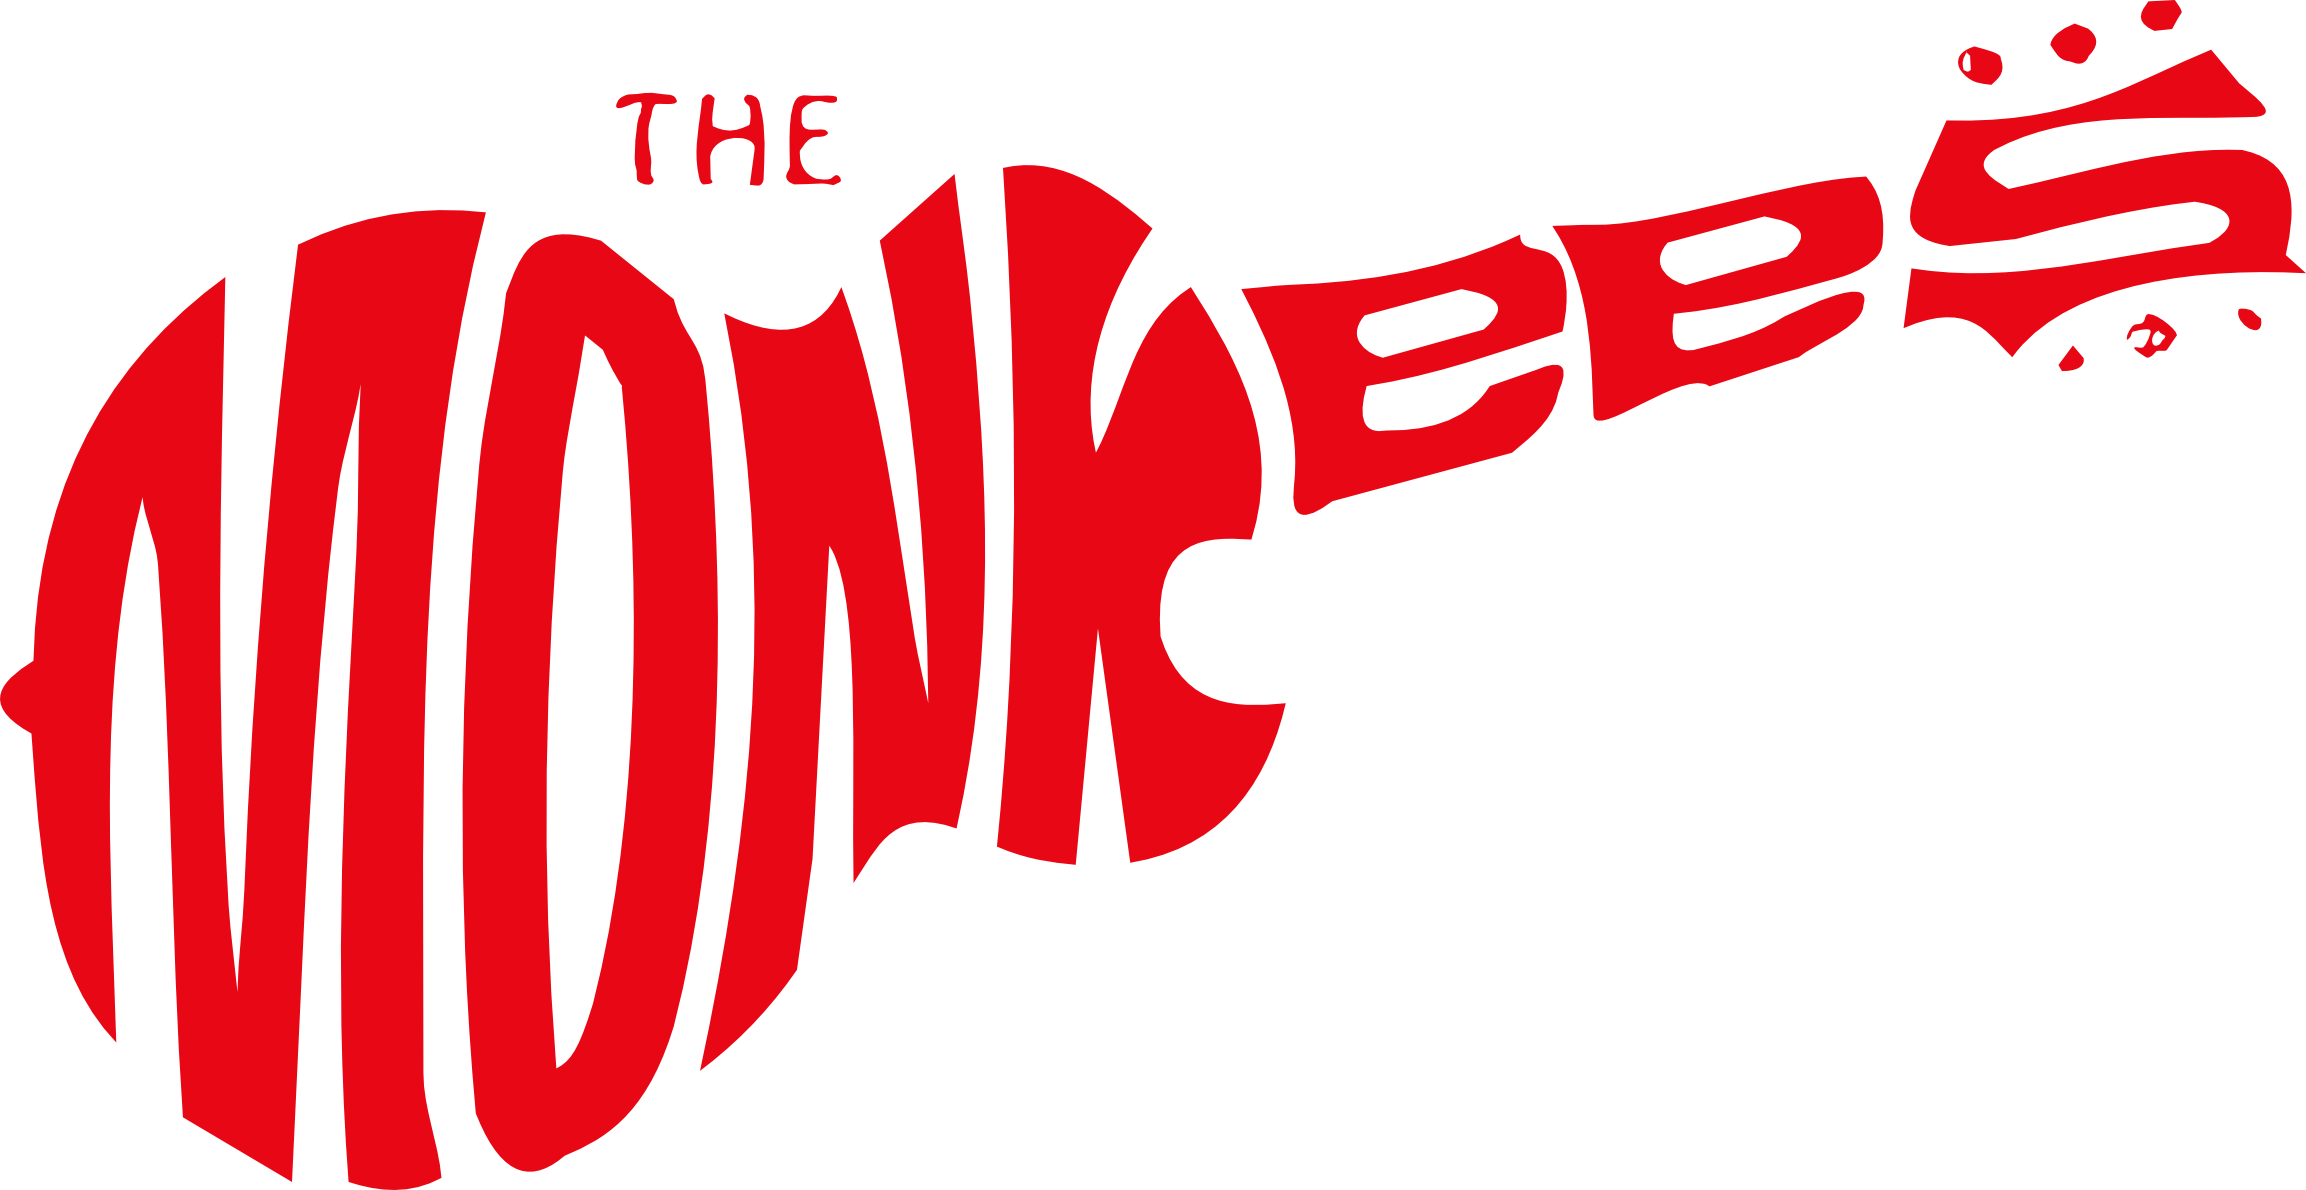 The Monkees (19661968) NBC, (1980s) reruns on Nickelodeon